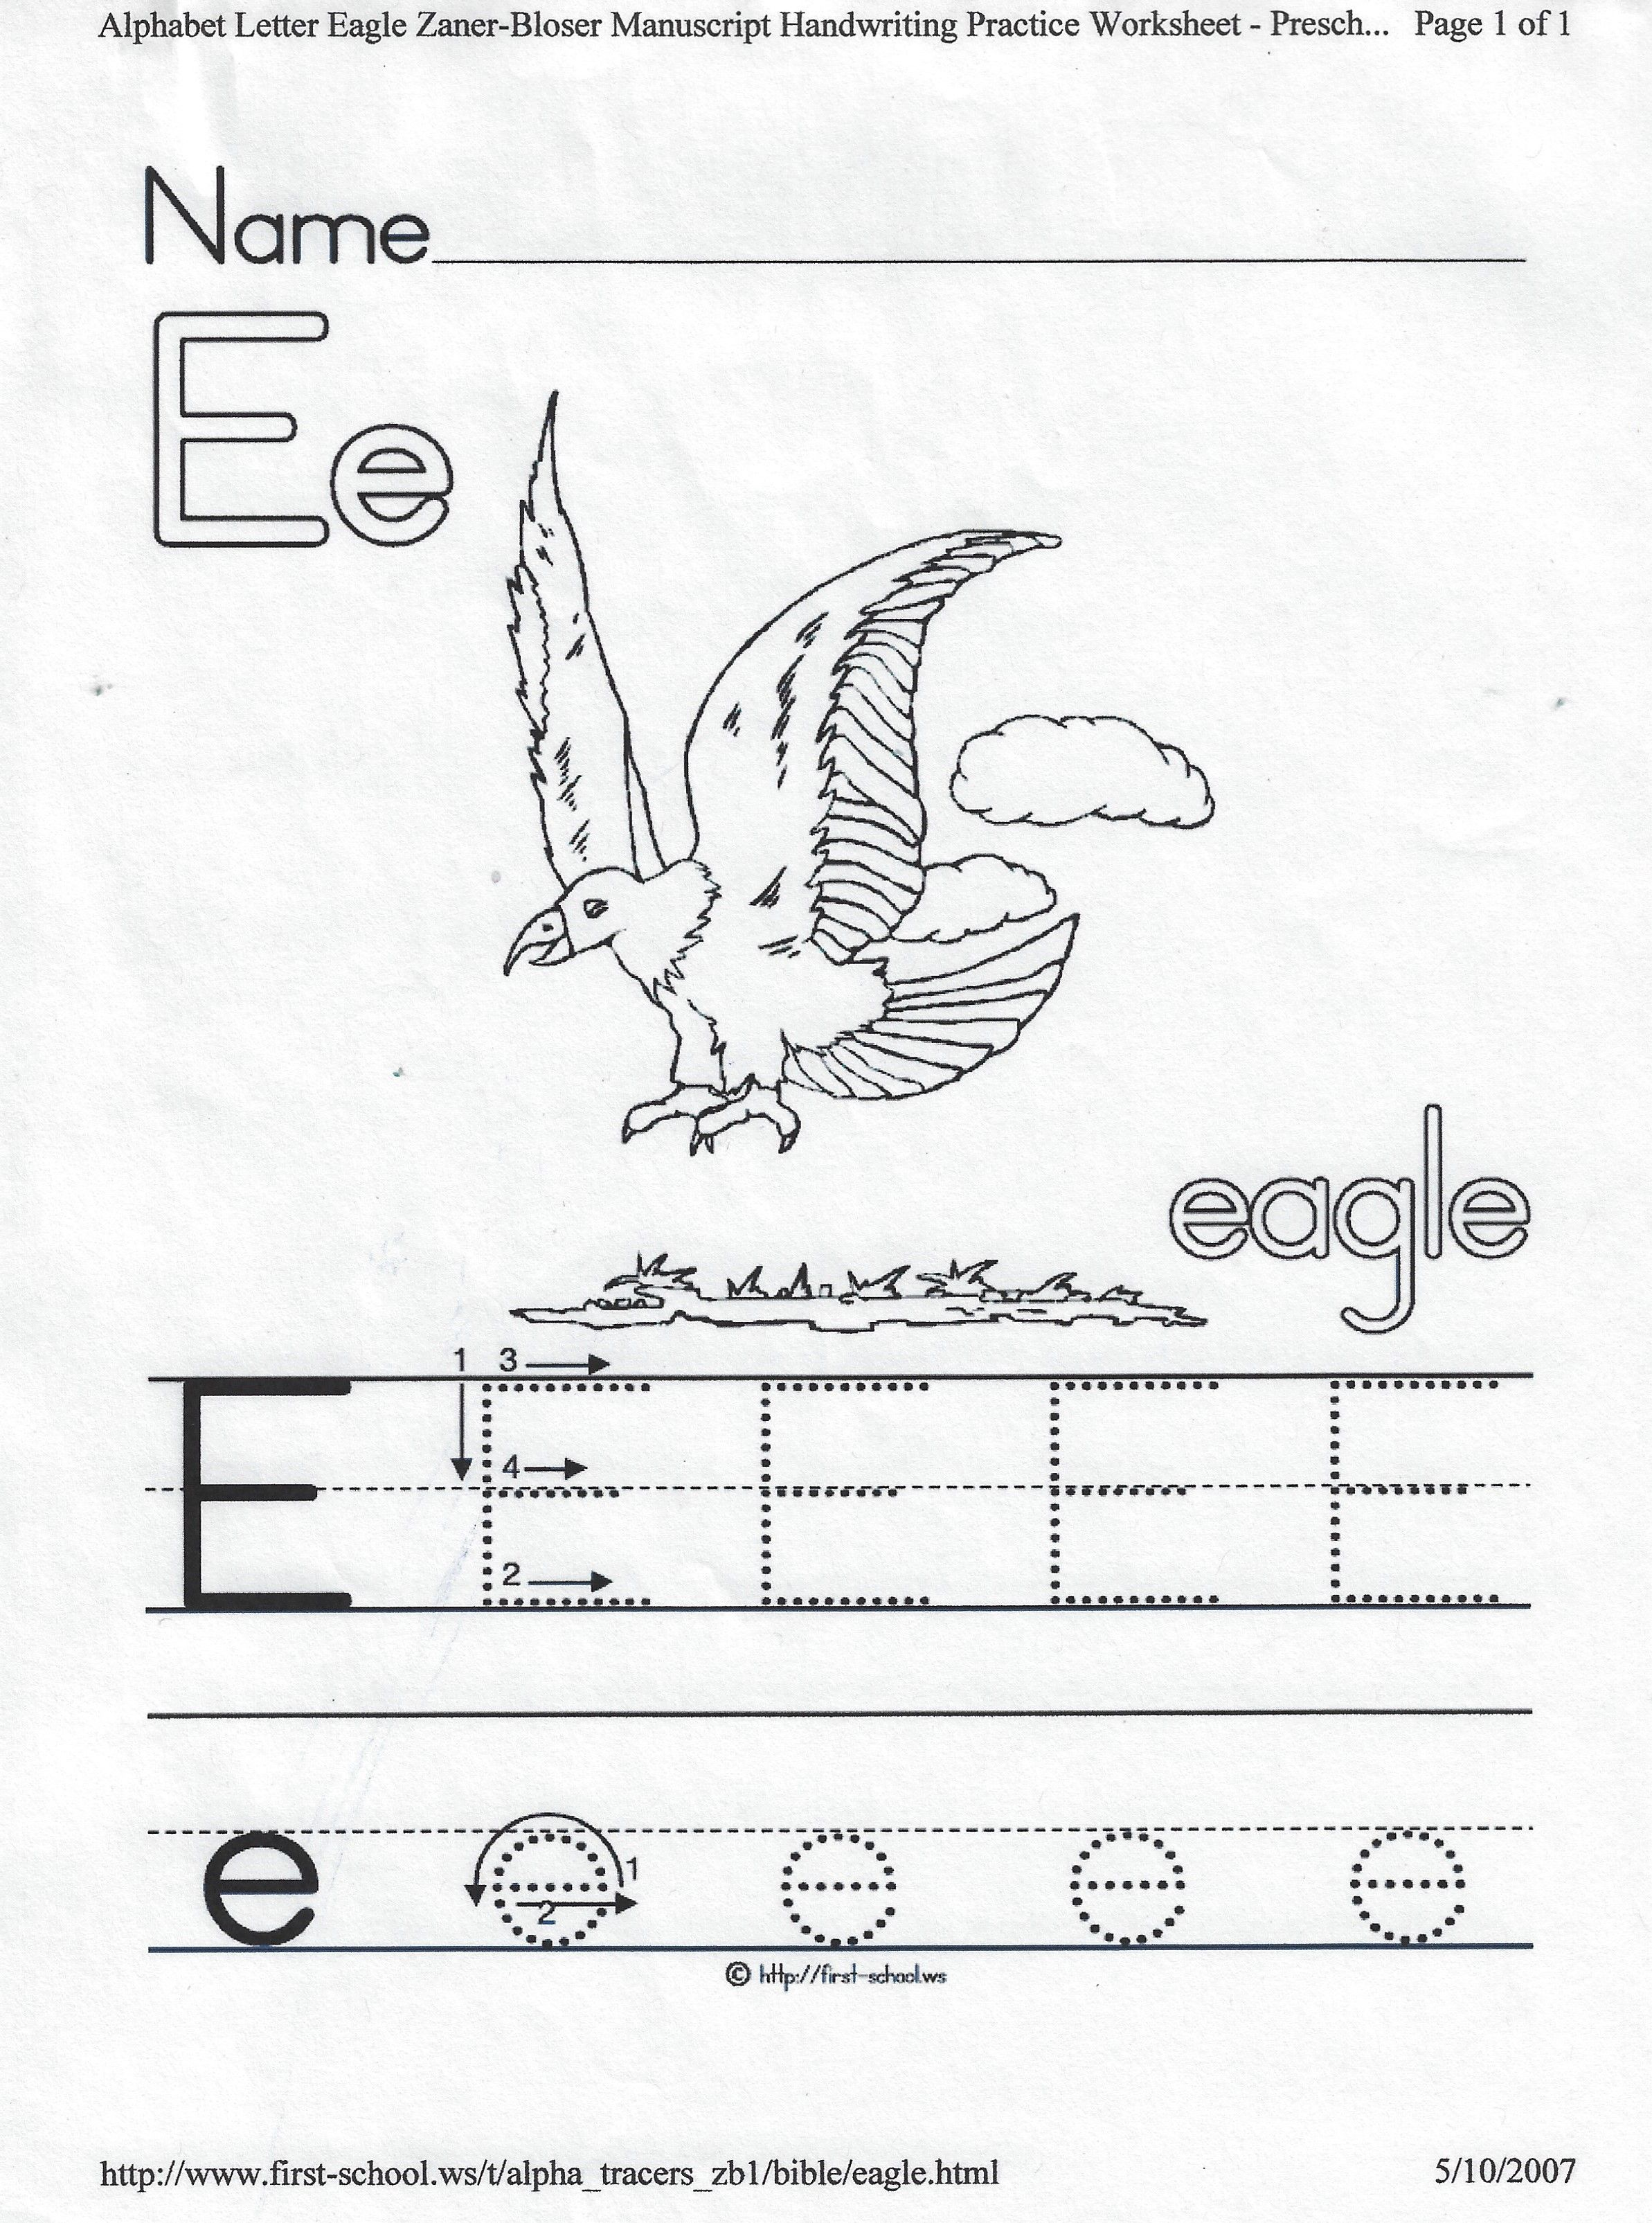 Pin By Guylaine Labbe On Bird Theme Preschool Handwriting Practice Worksheets Lettering Alphabet Handwriting Practice [ 3210 x 2386 Pixel ]